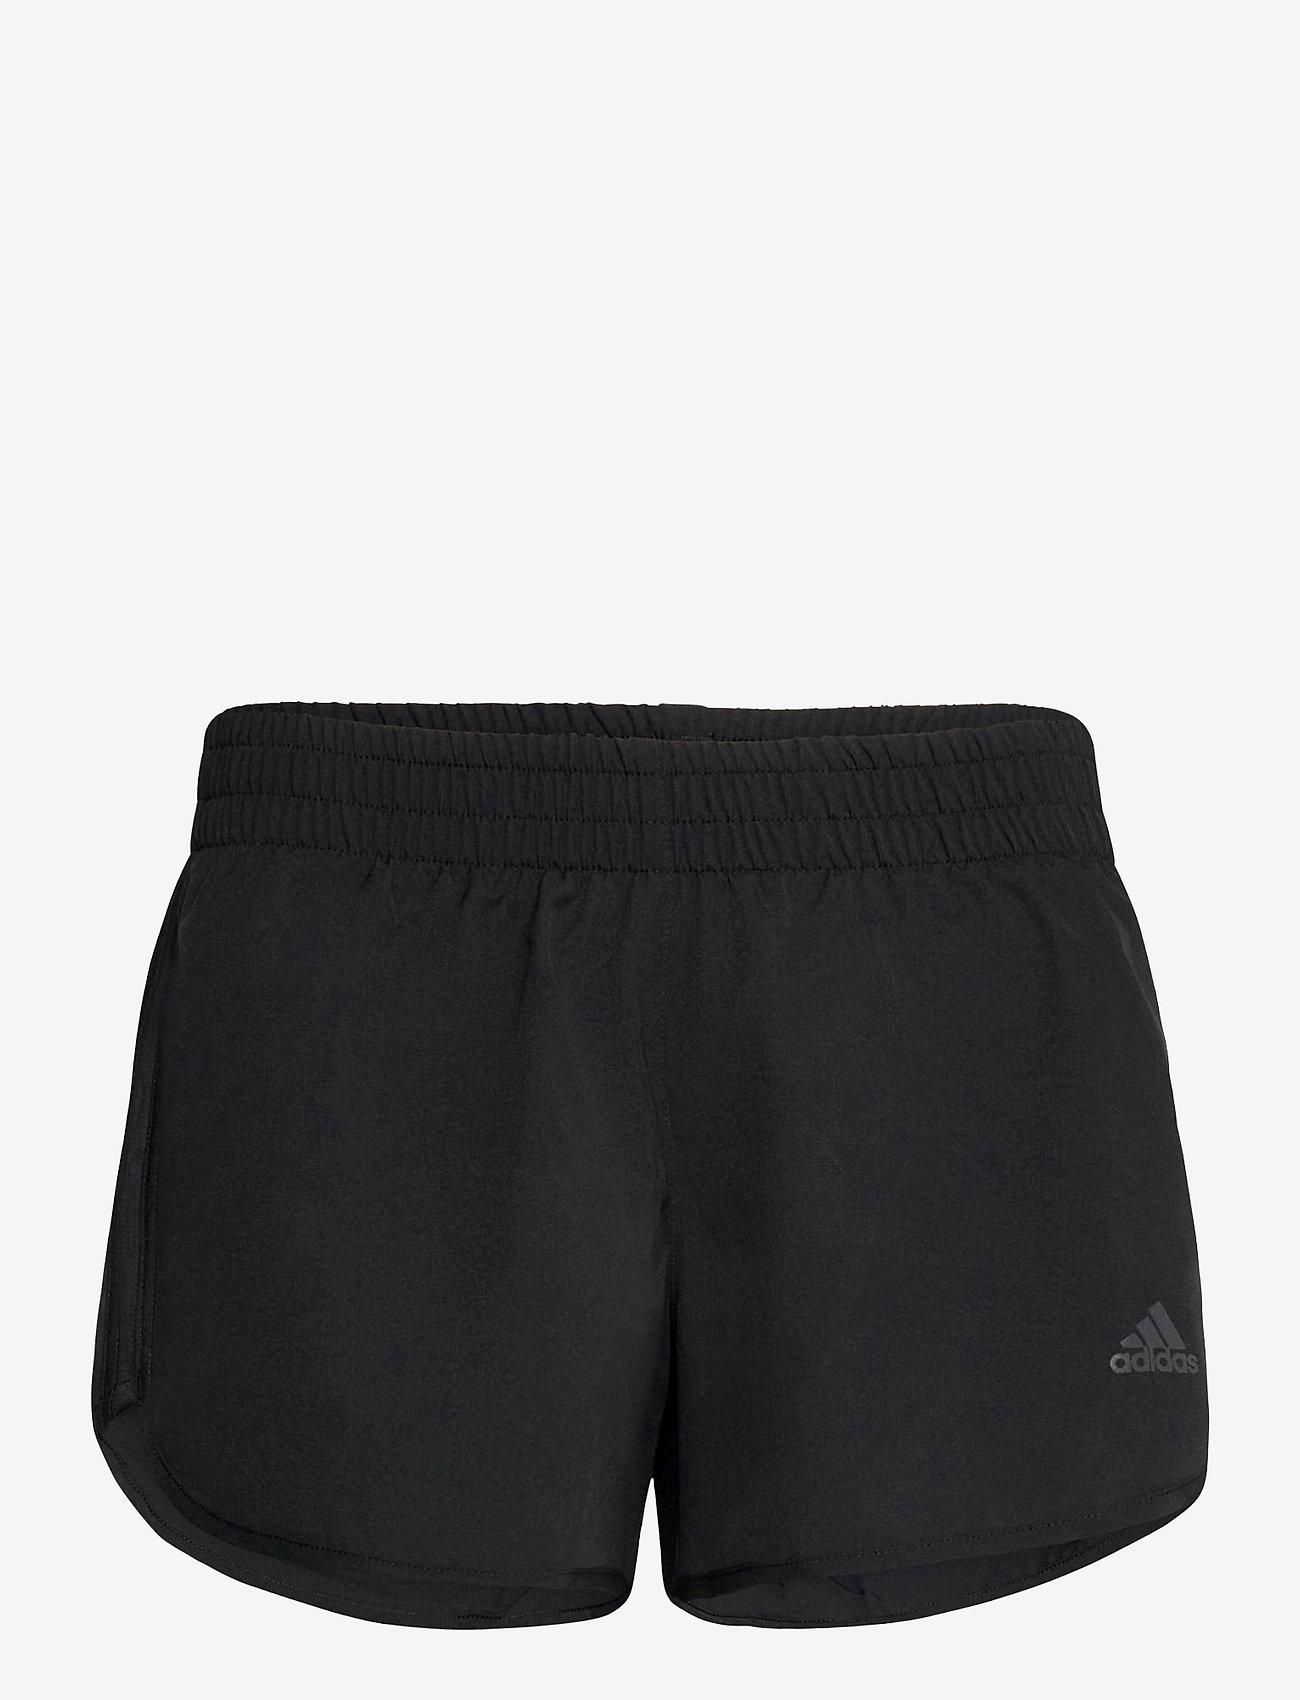 adidas Performance - Marathon 20 Shorts W - træningsshorts - black/black - 0